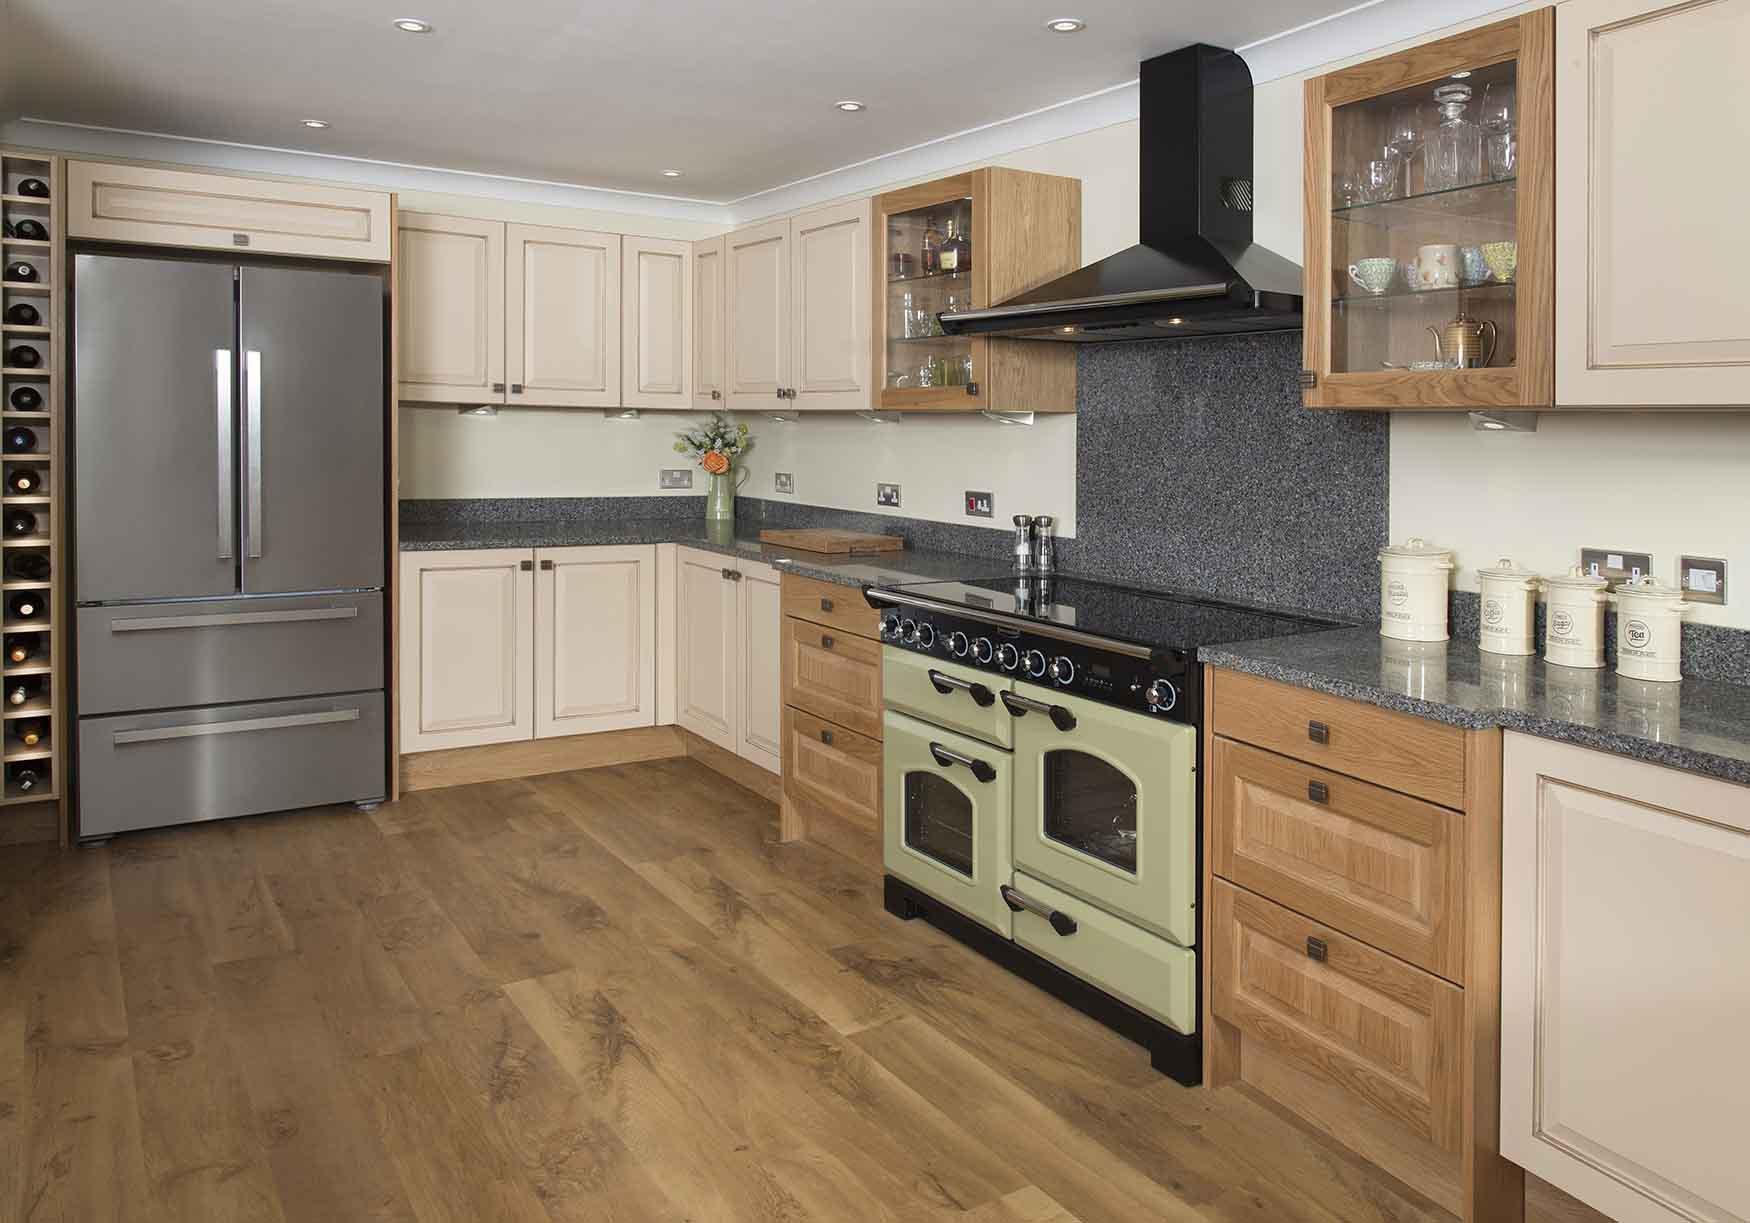 New kitchens Kidderminster